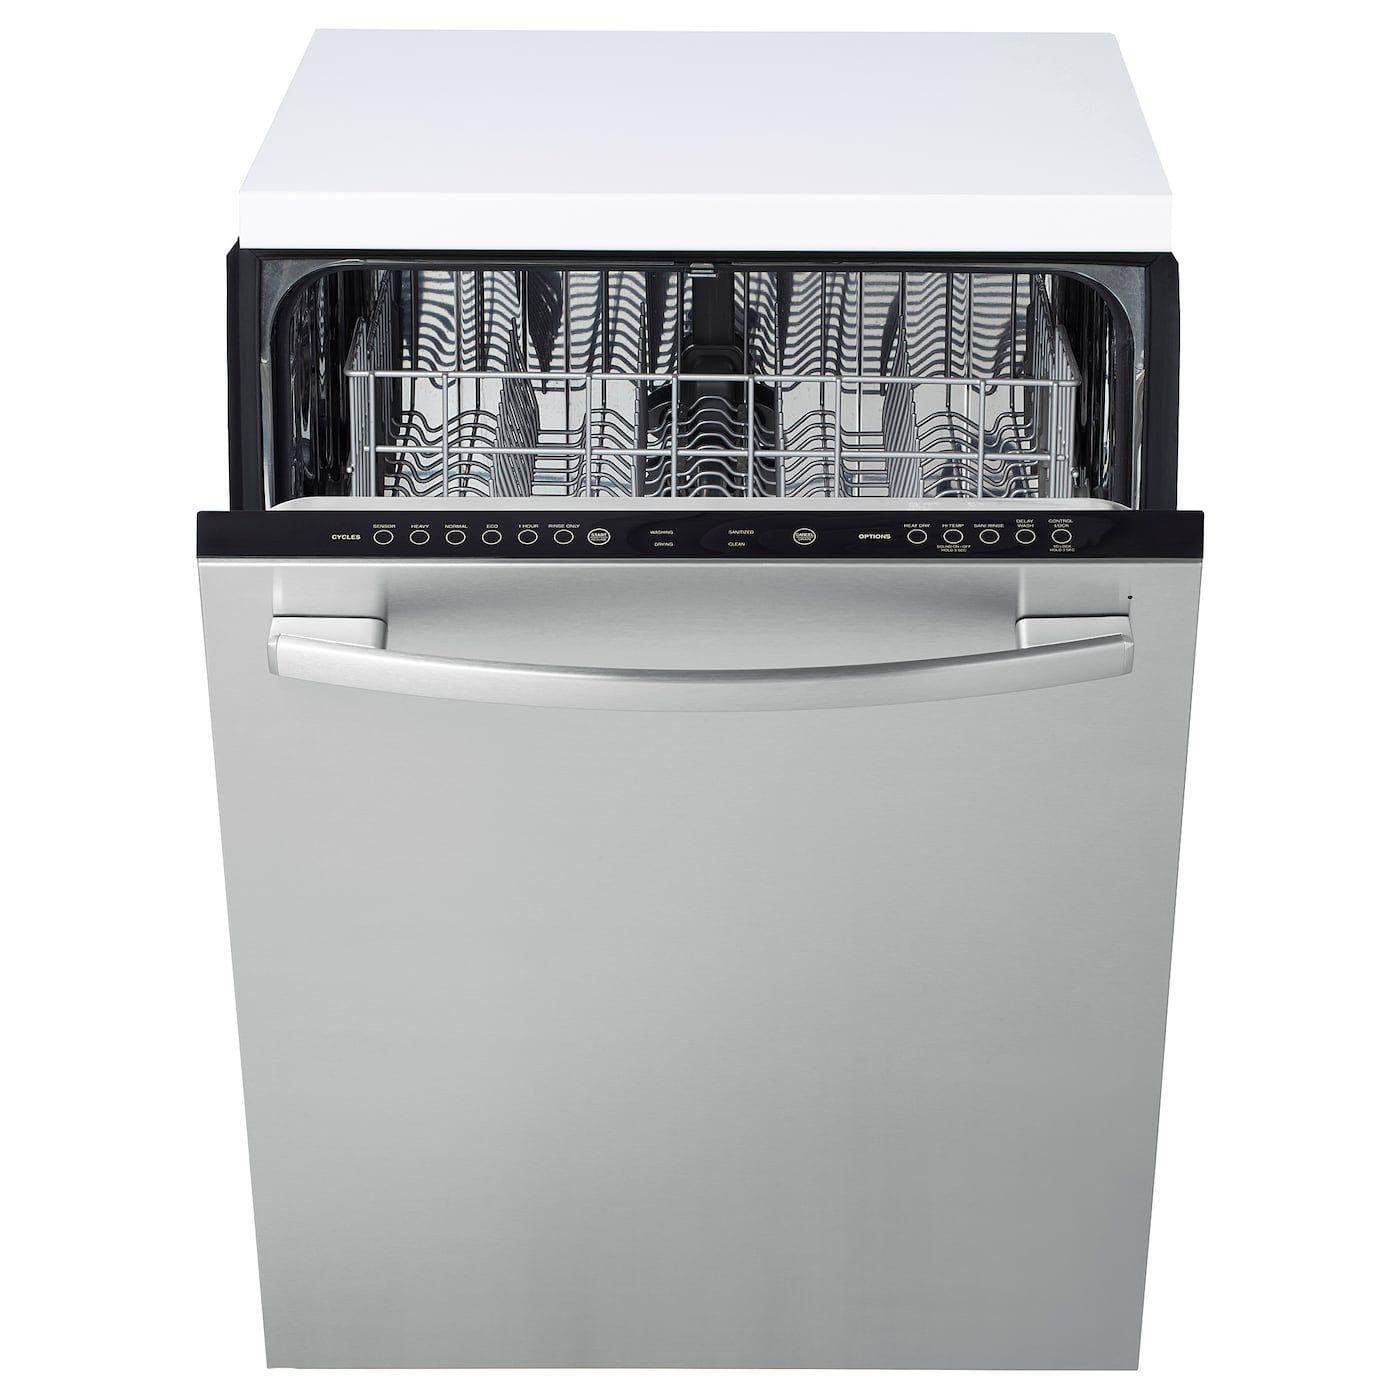 Betrodd builtin dishwasher stainless steel ikea